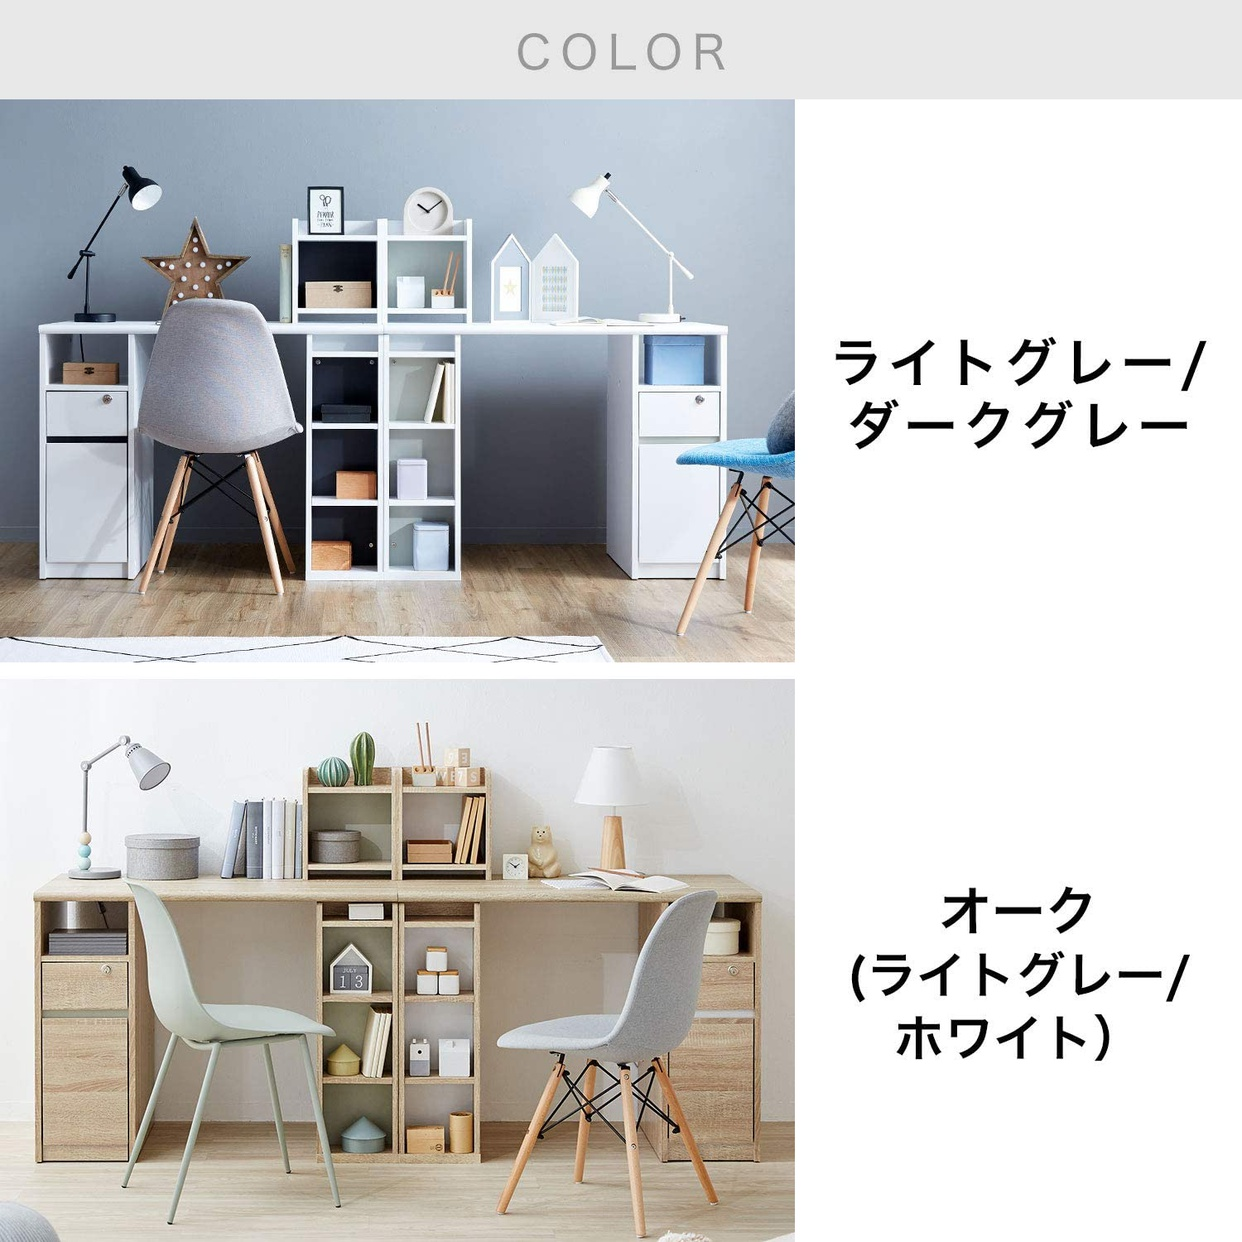 LOWYA(ロウヤ) 学習机 2人用ツインデスク 本棚・サイドラック付きの商品画像6